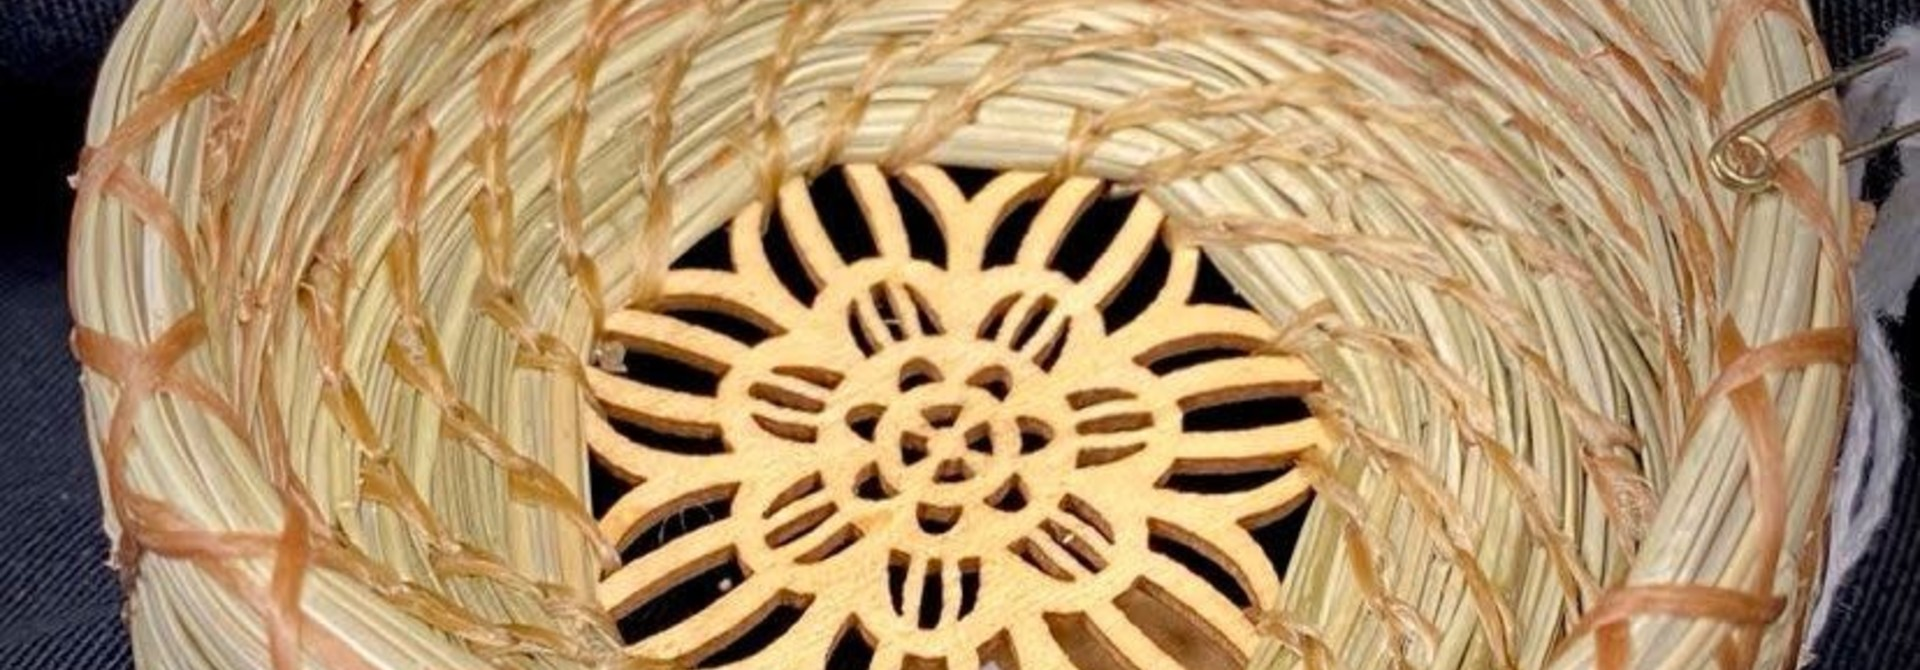 Pine Needle Basket with Wooden Bottom